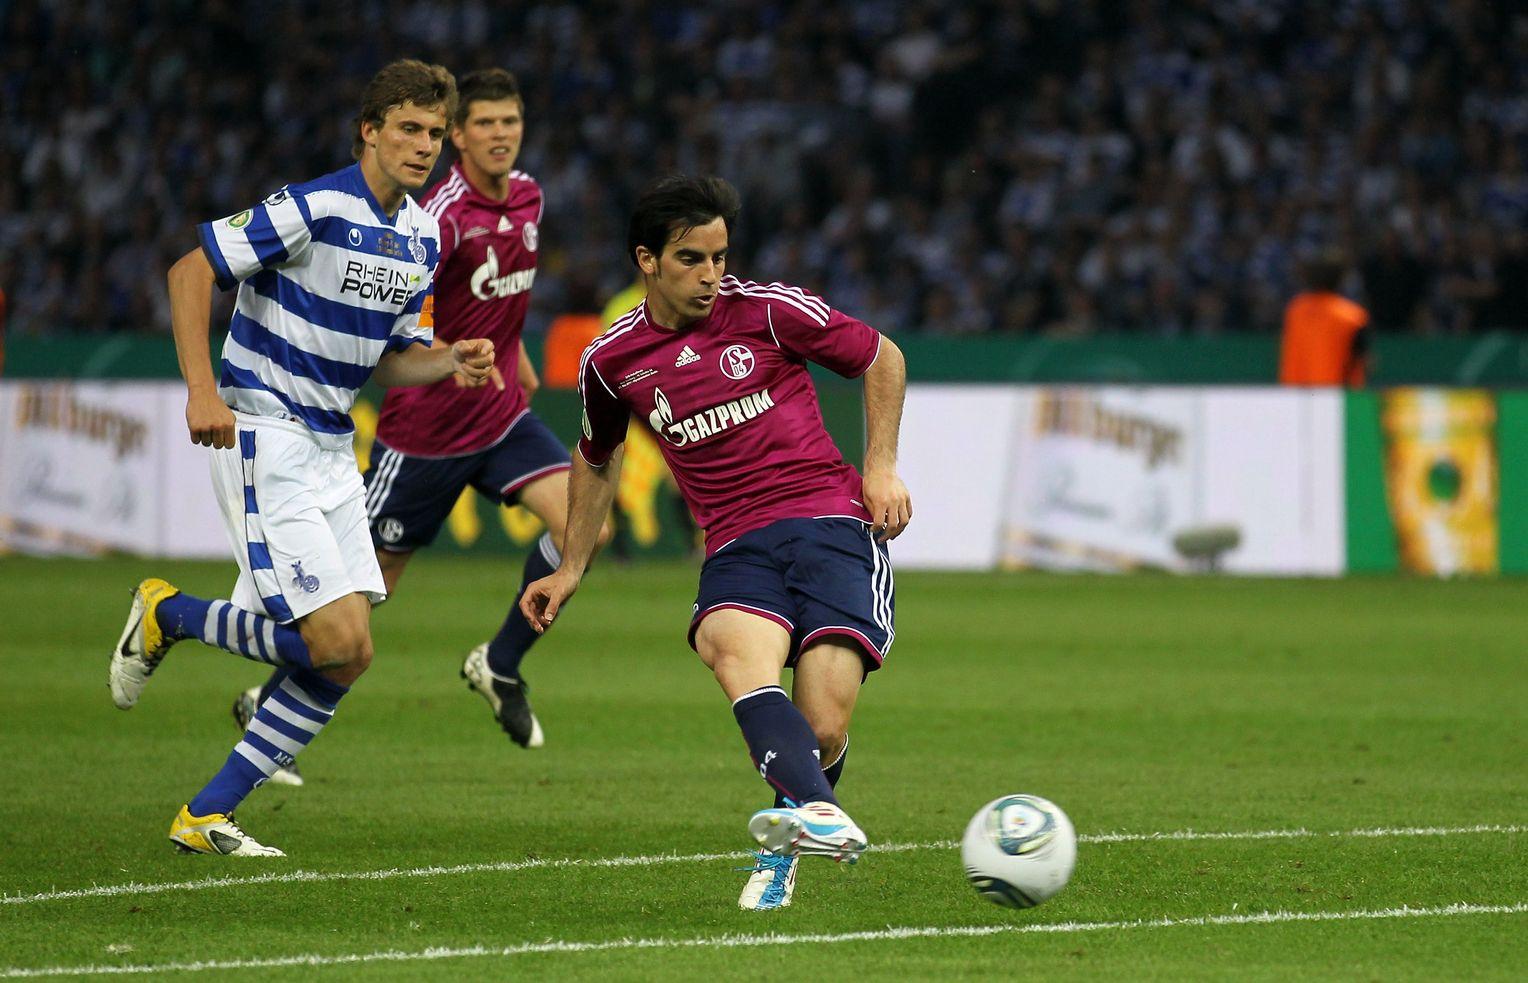 Schalke Gegen Duisburg